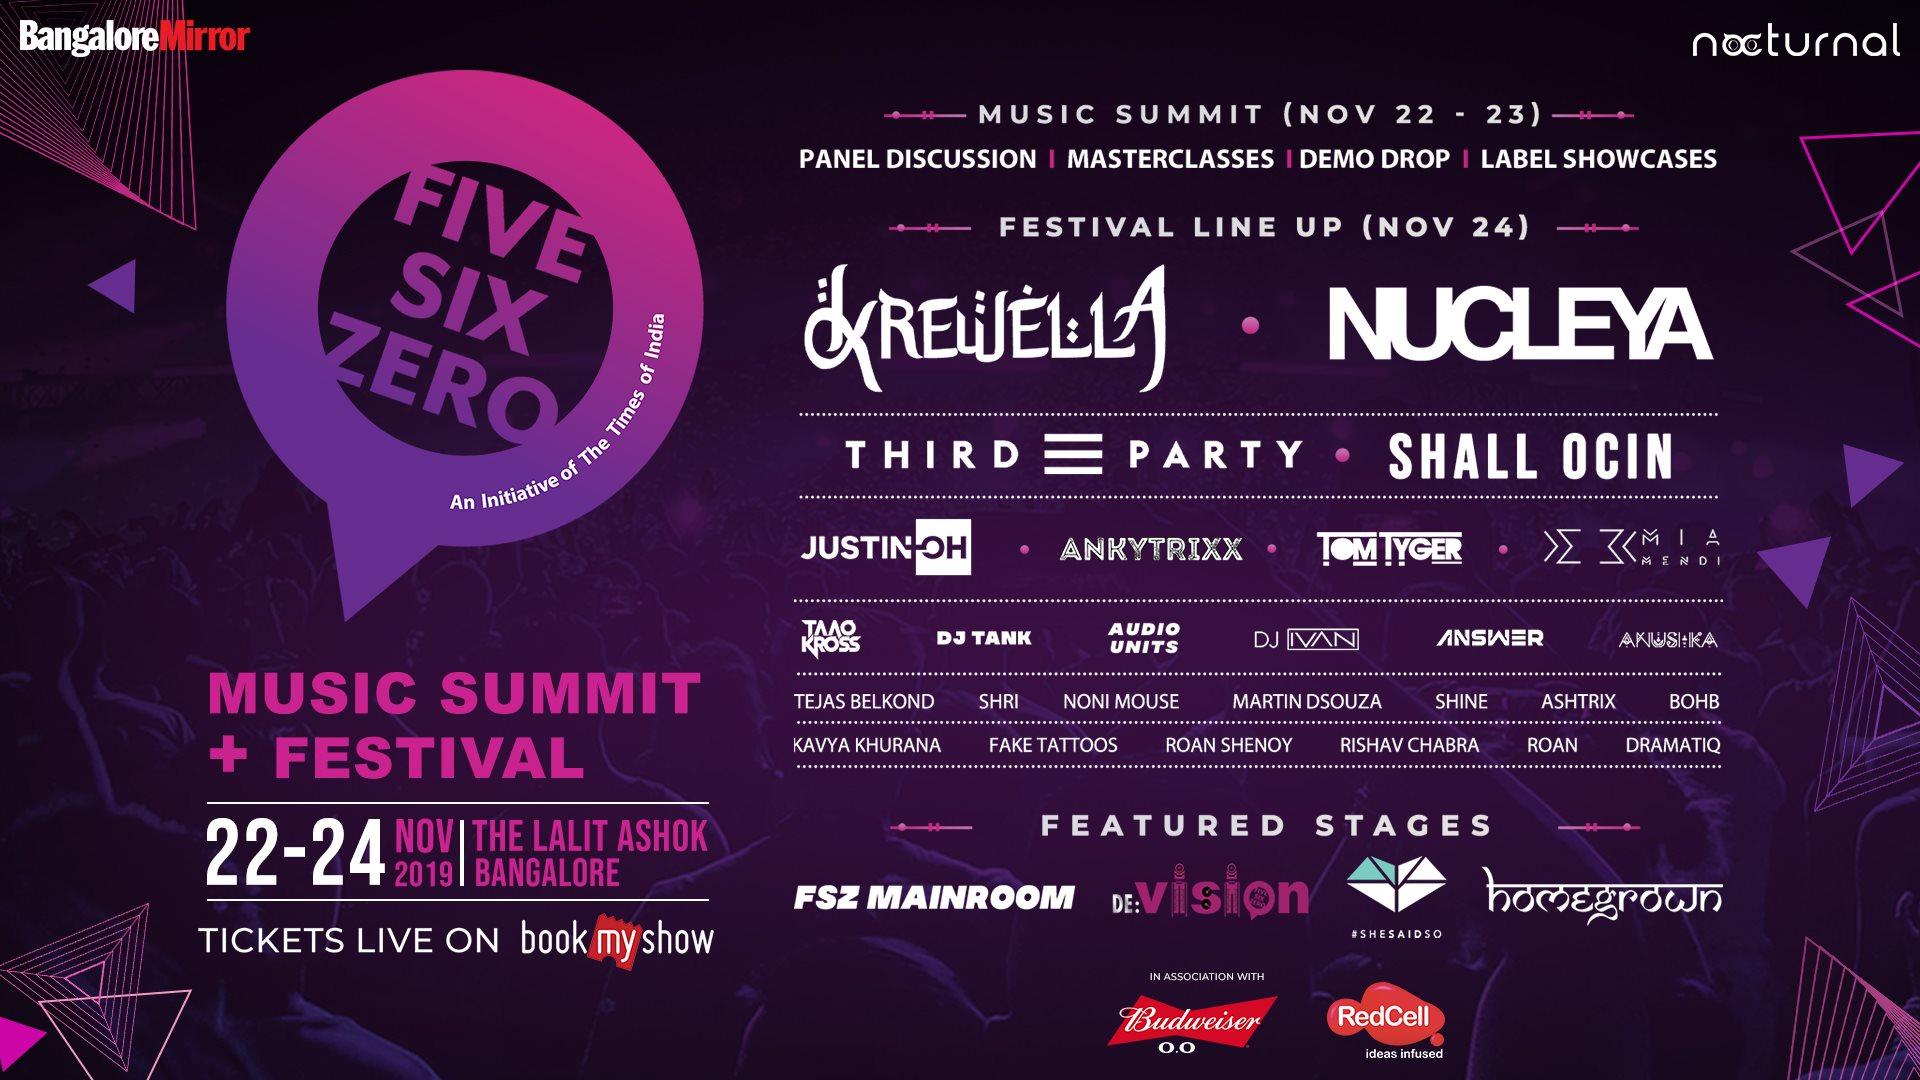 Five Six Zero 2019 - Music Festival (Sunday, Nov 24)